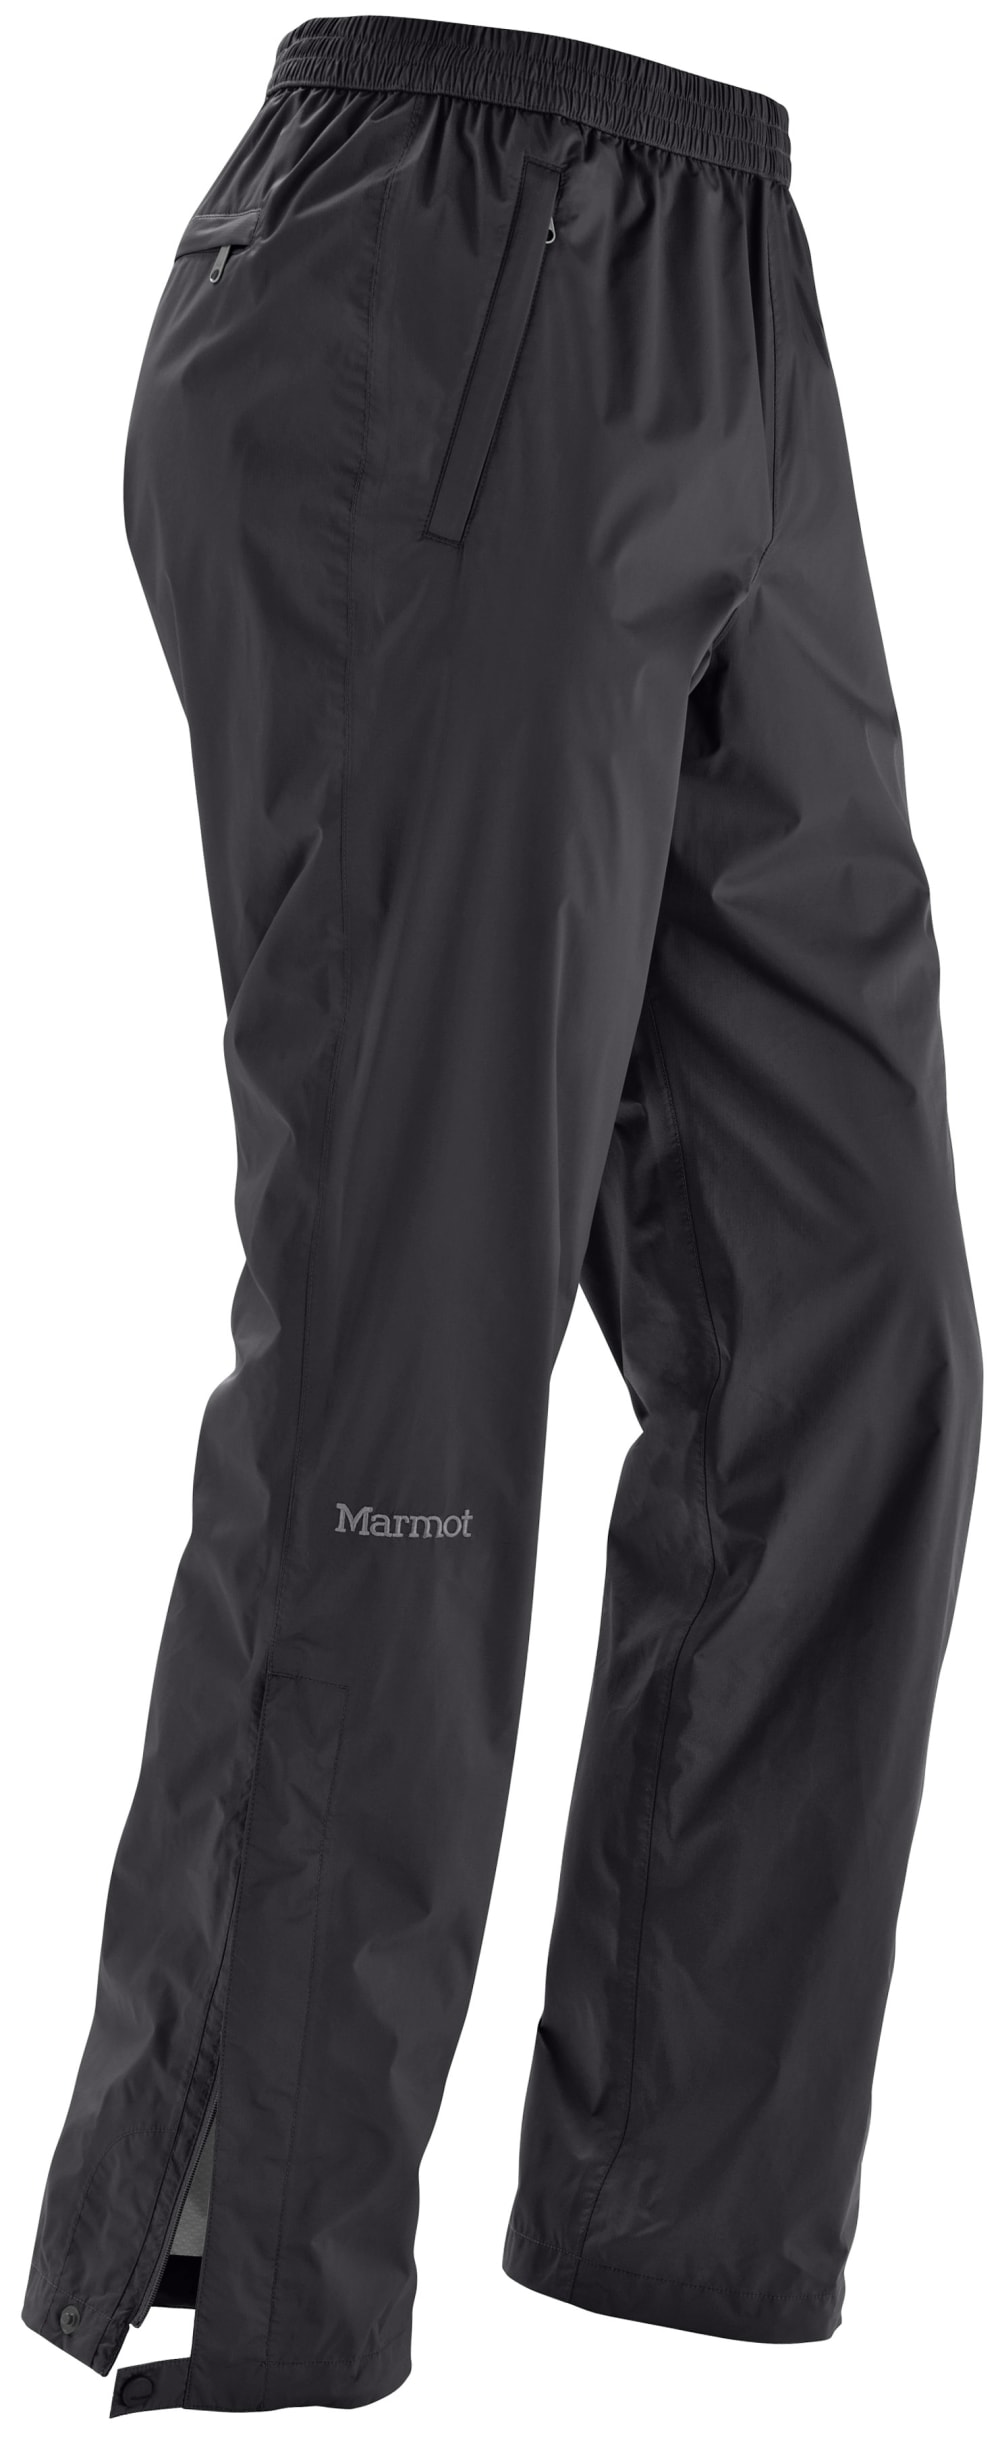 MARMOT Men's PreCip Pants - 001-BLACK